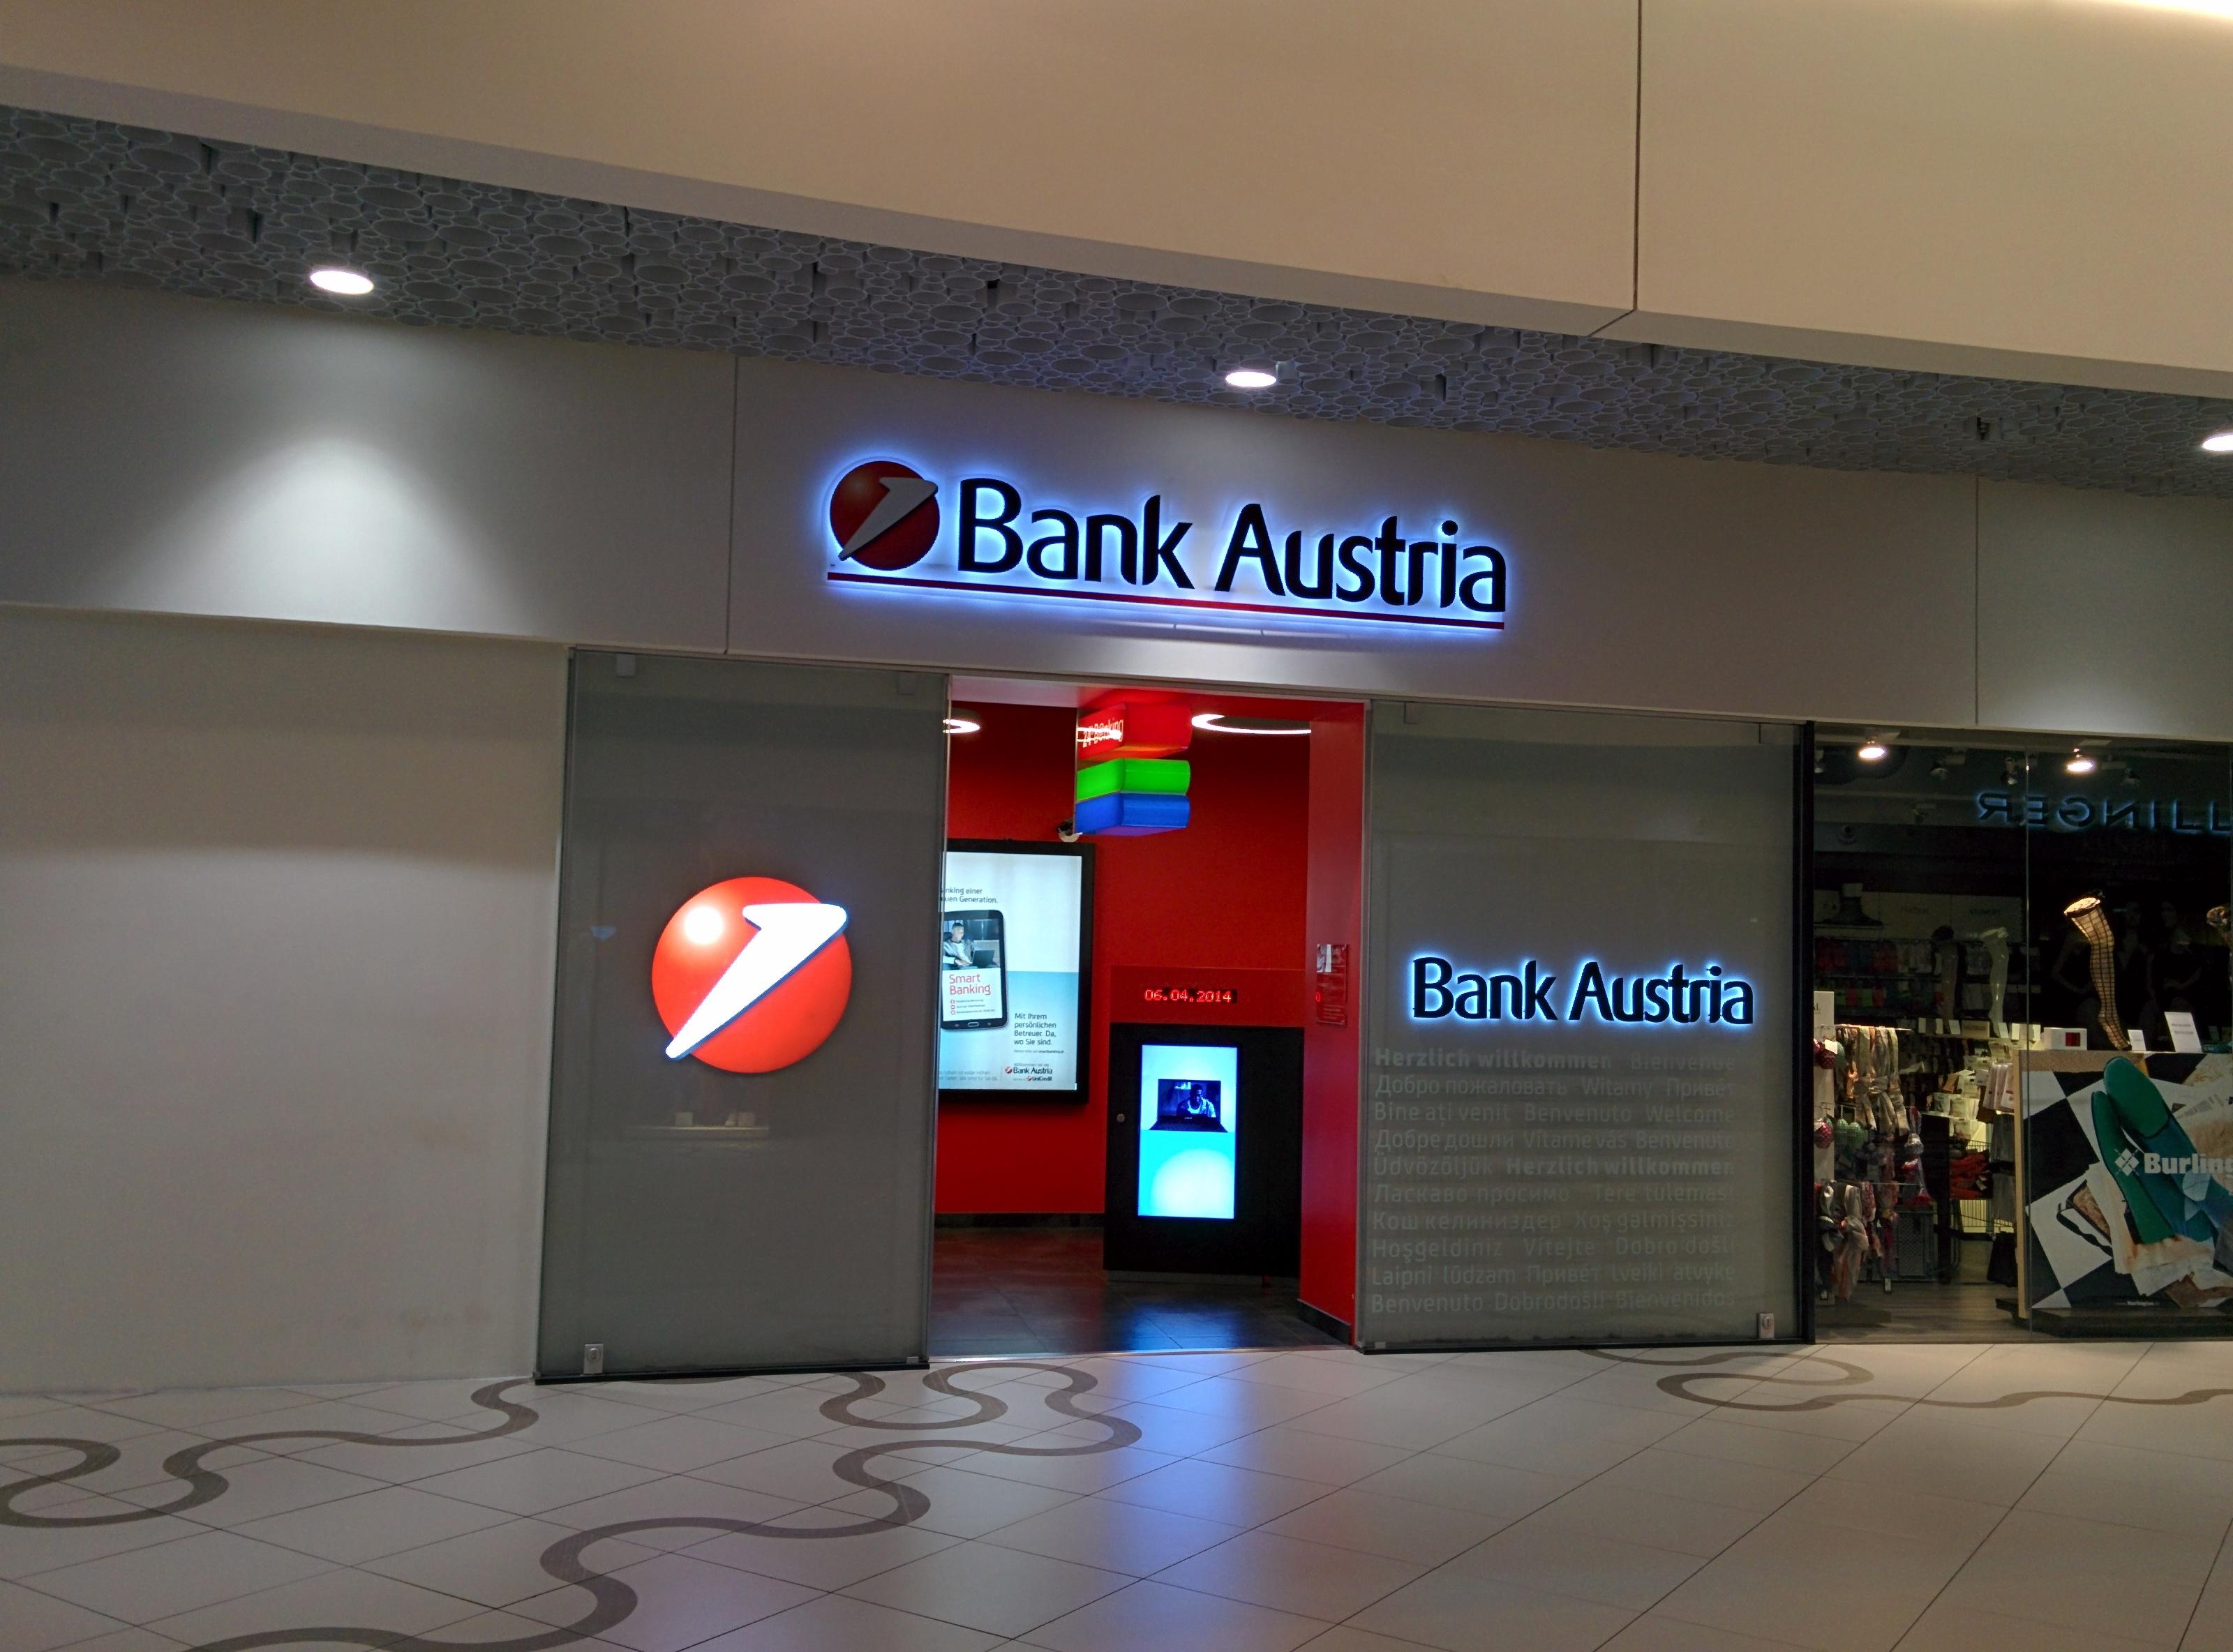 Bank Austria Wien Mitte Unicredit Bic Bkauatww Blz 12000